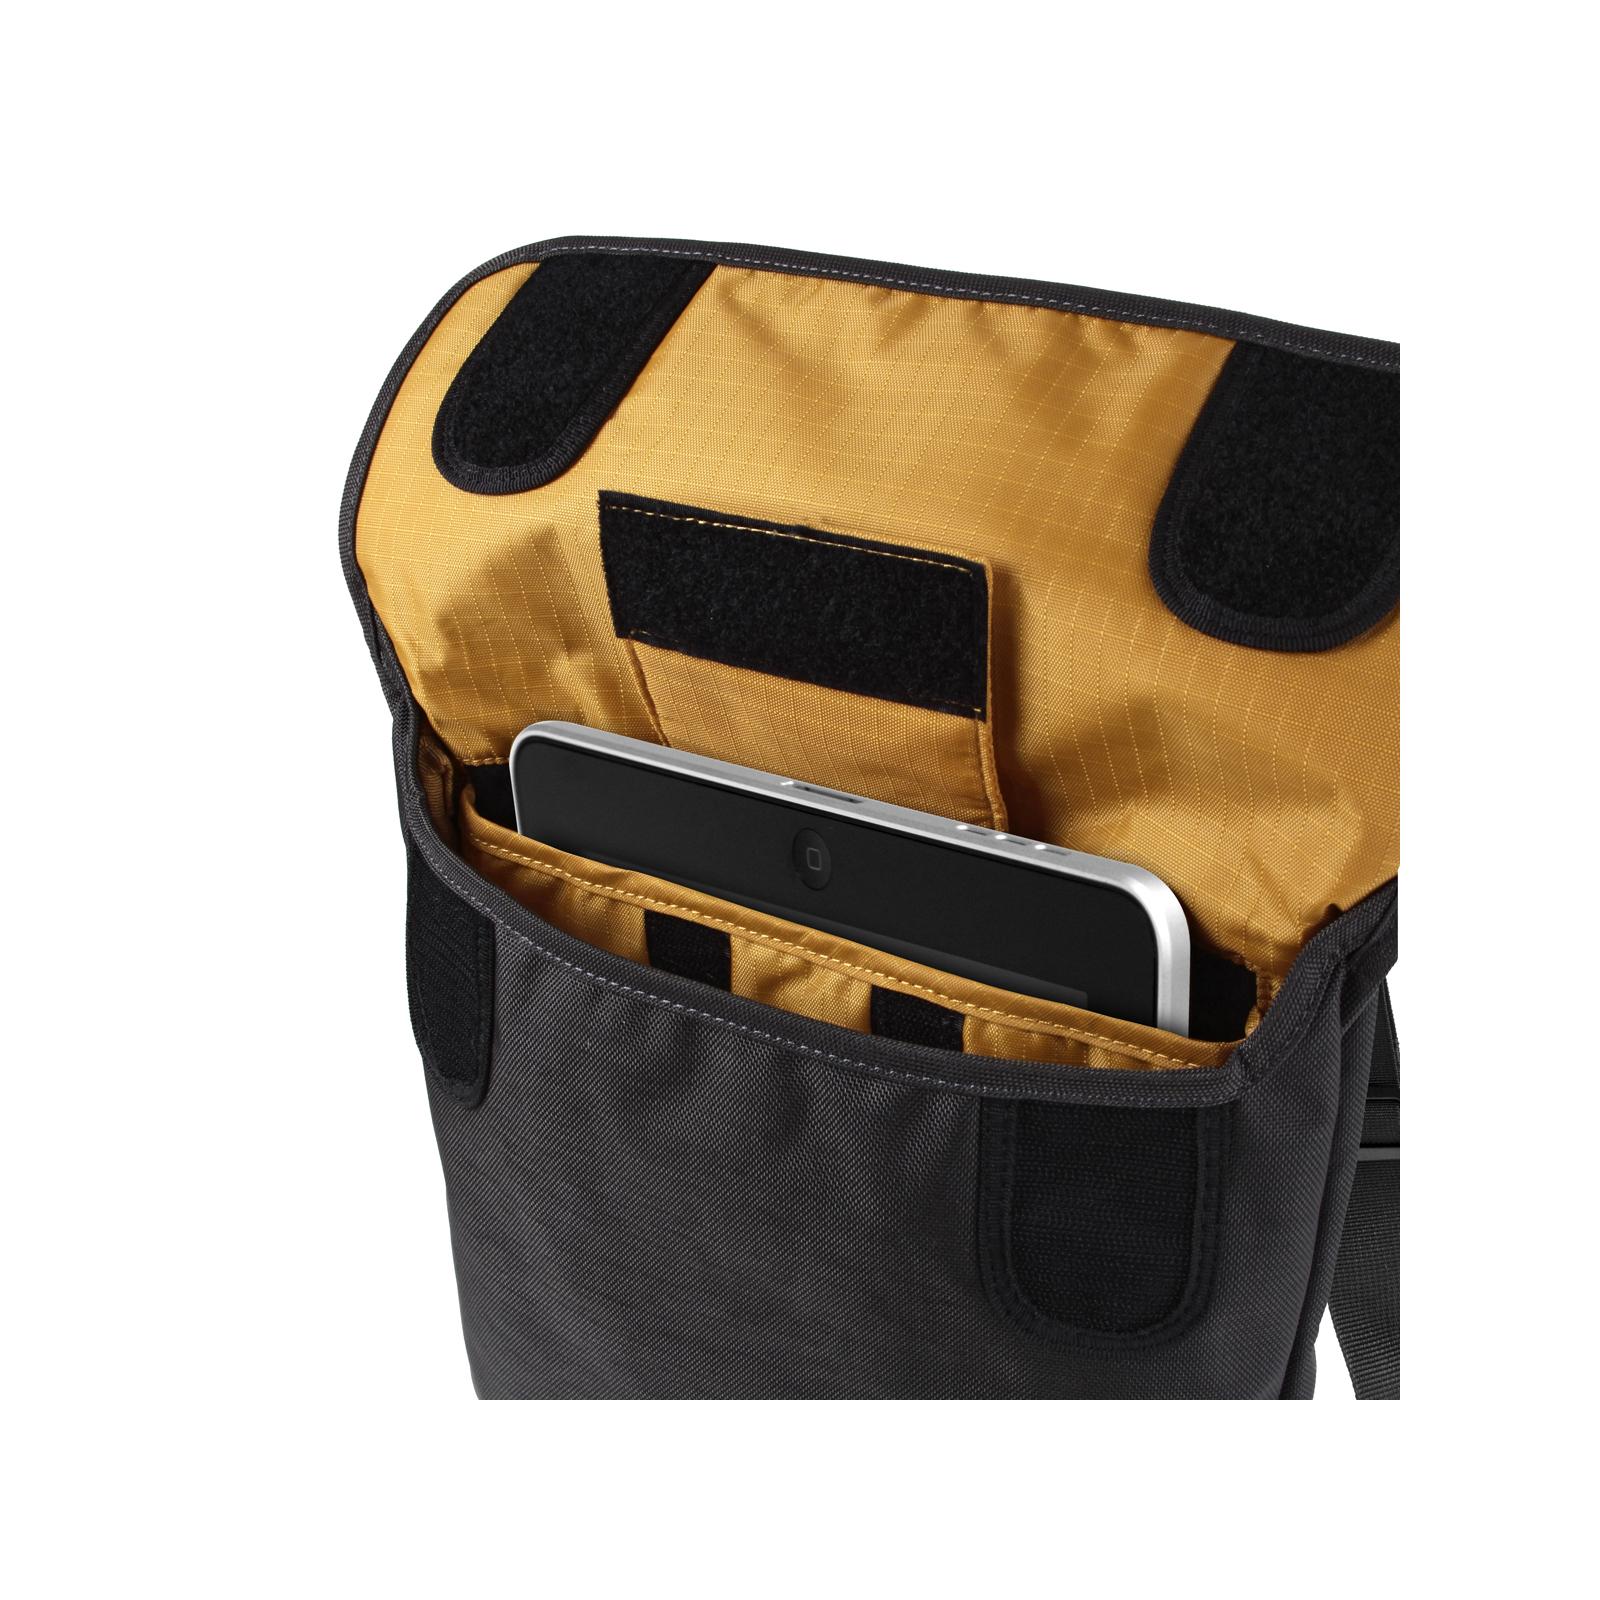 Чехол для планшета Crumpler 9 Private Surprise Sling Tablet/charcoal - orange (PSST-004) изображение 5